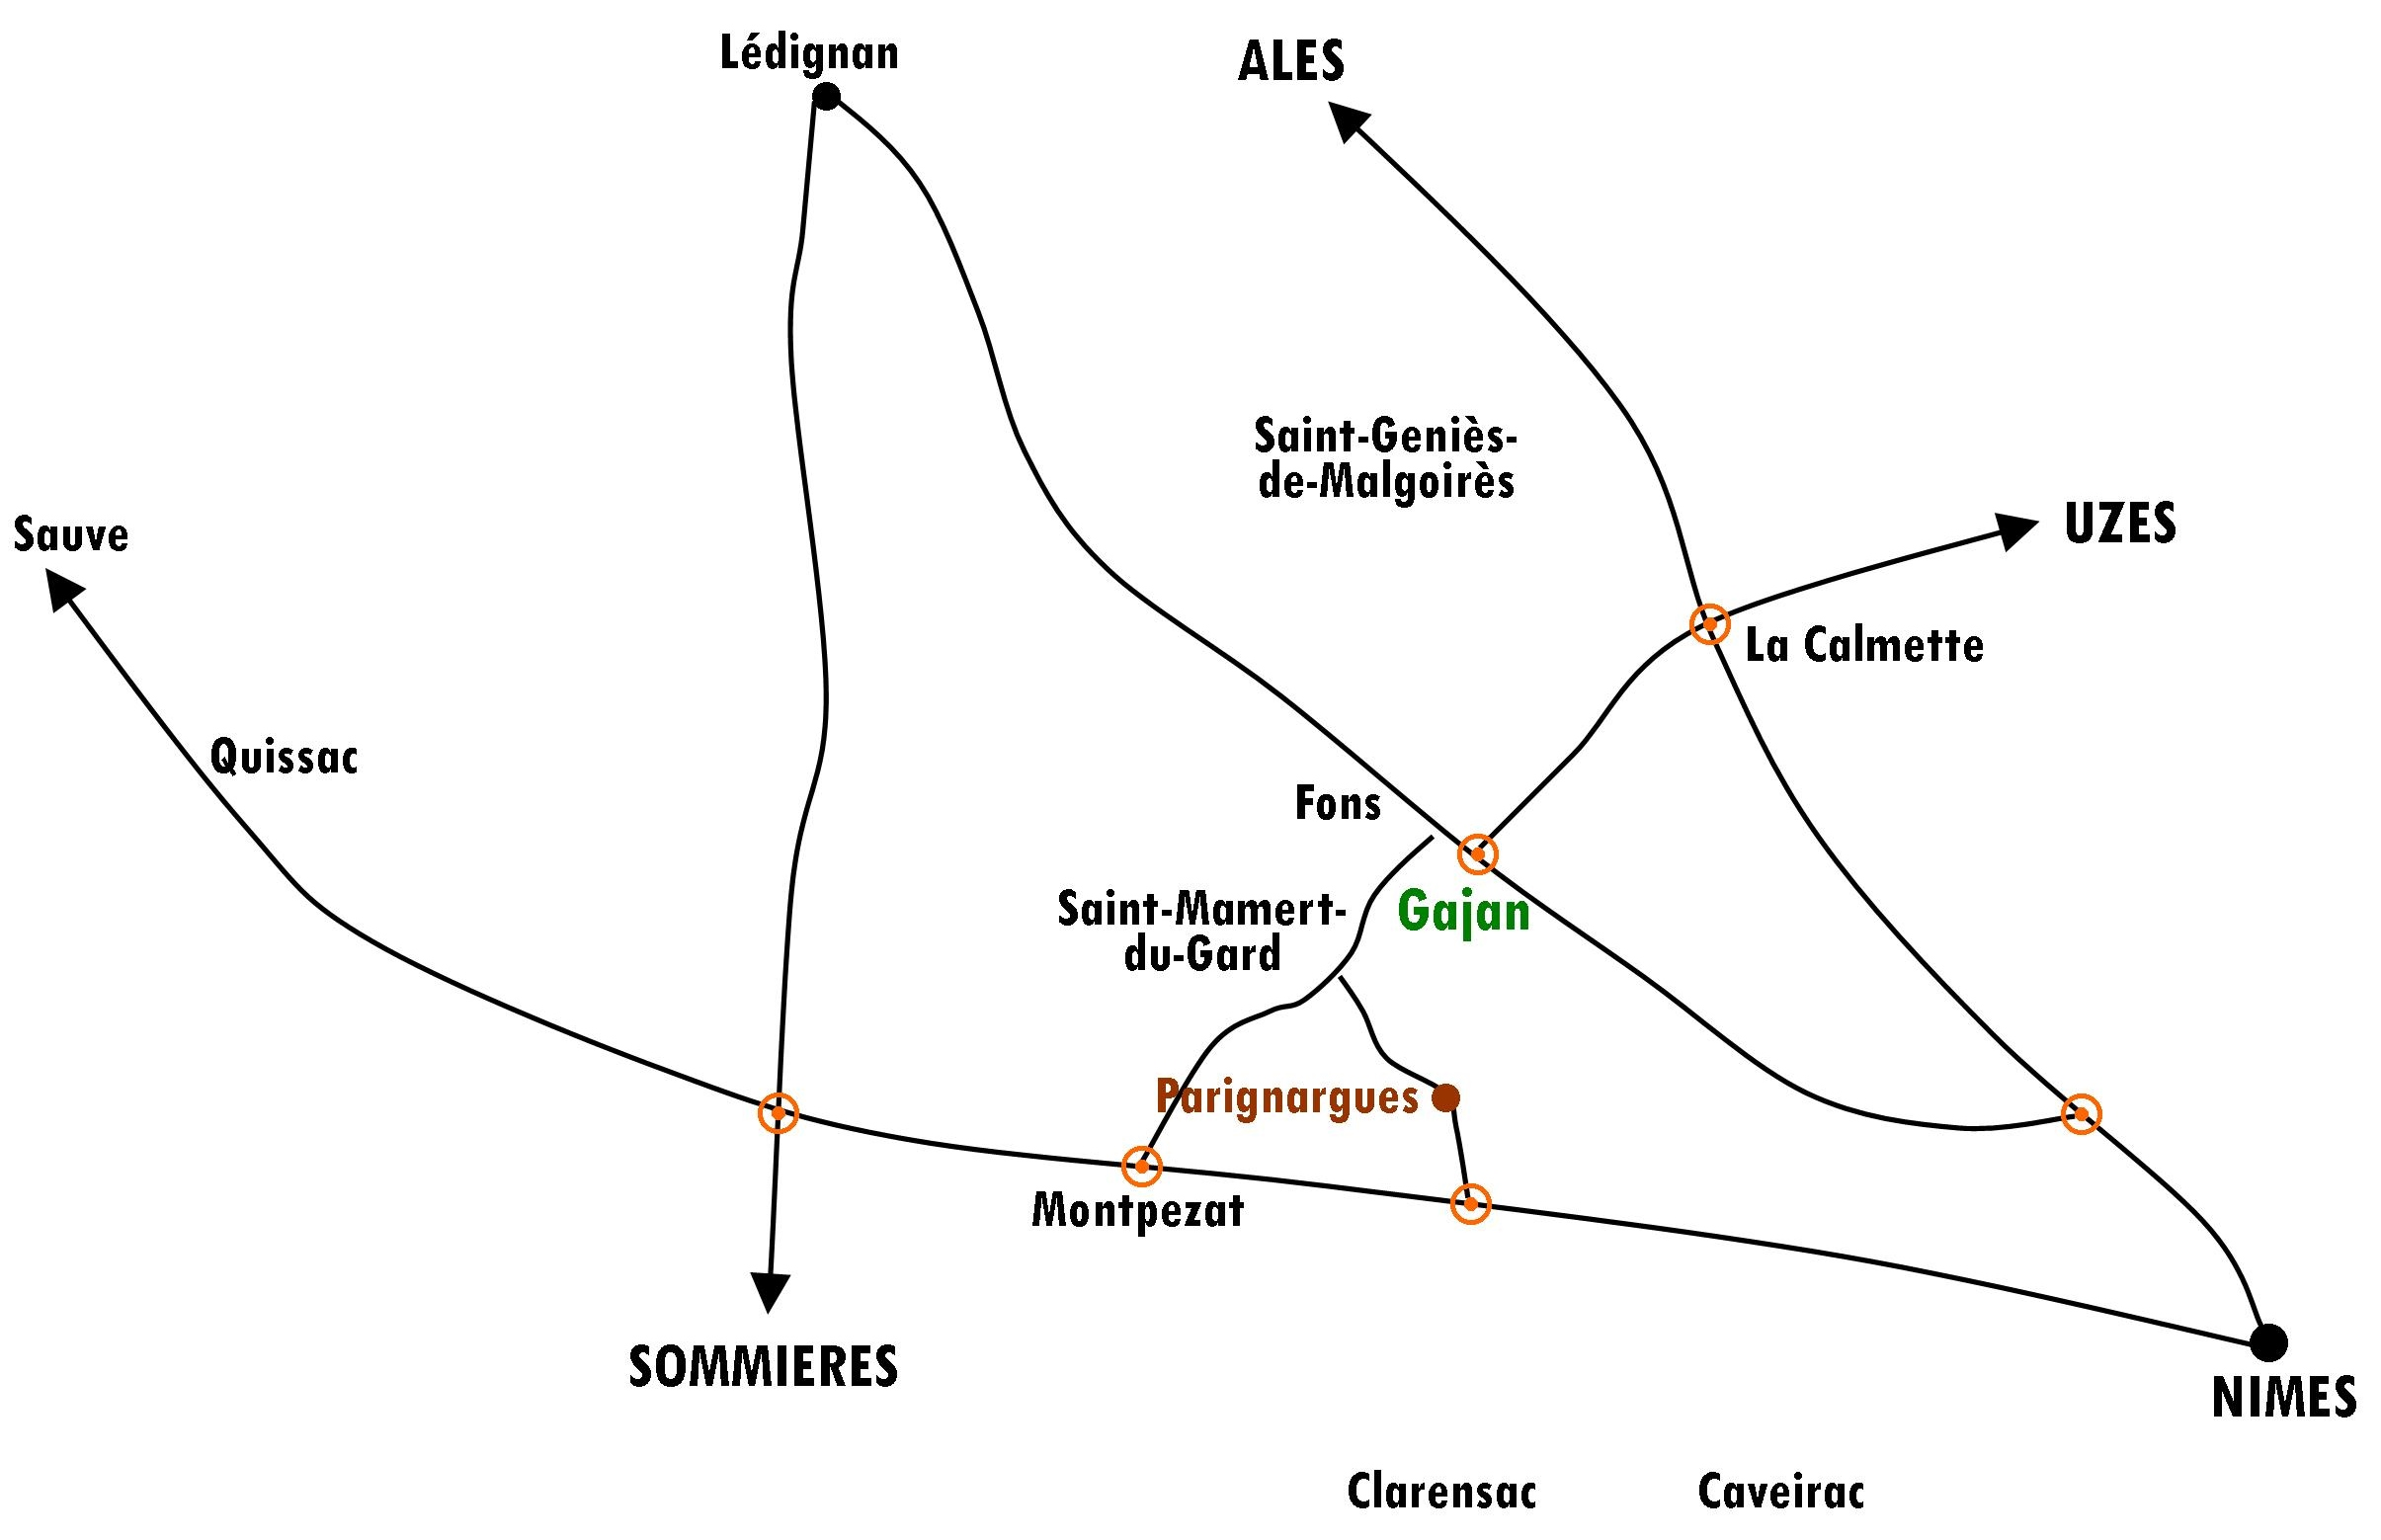 Plan CC - Gajan